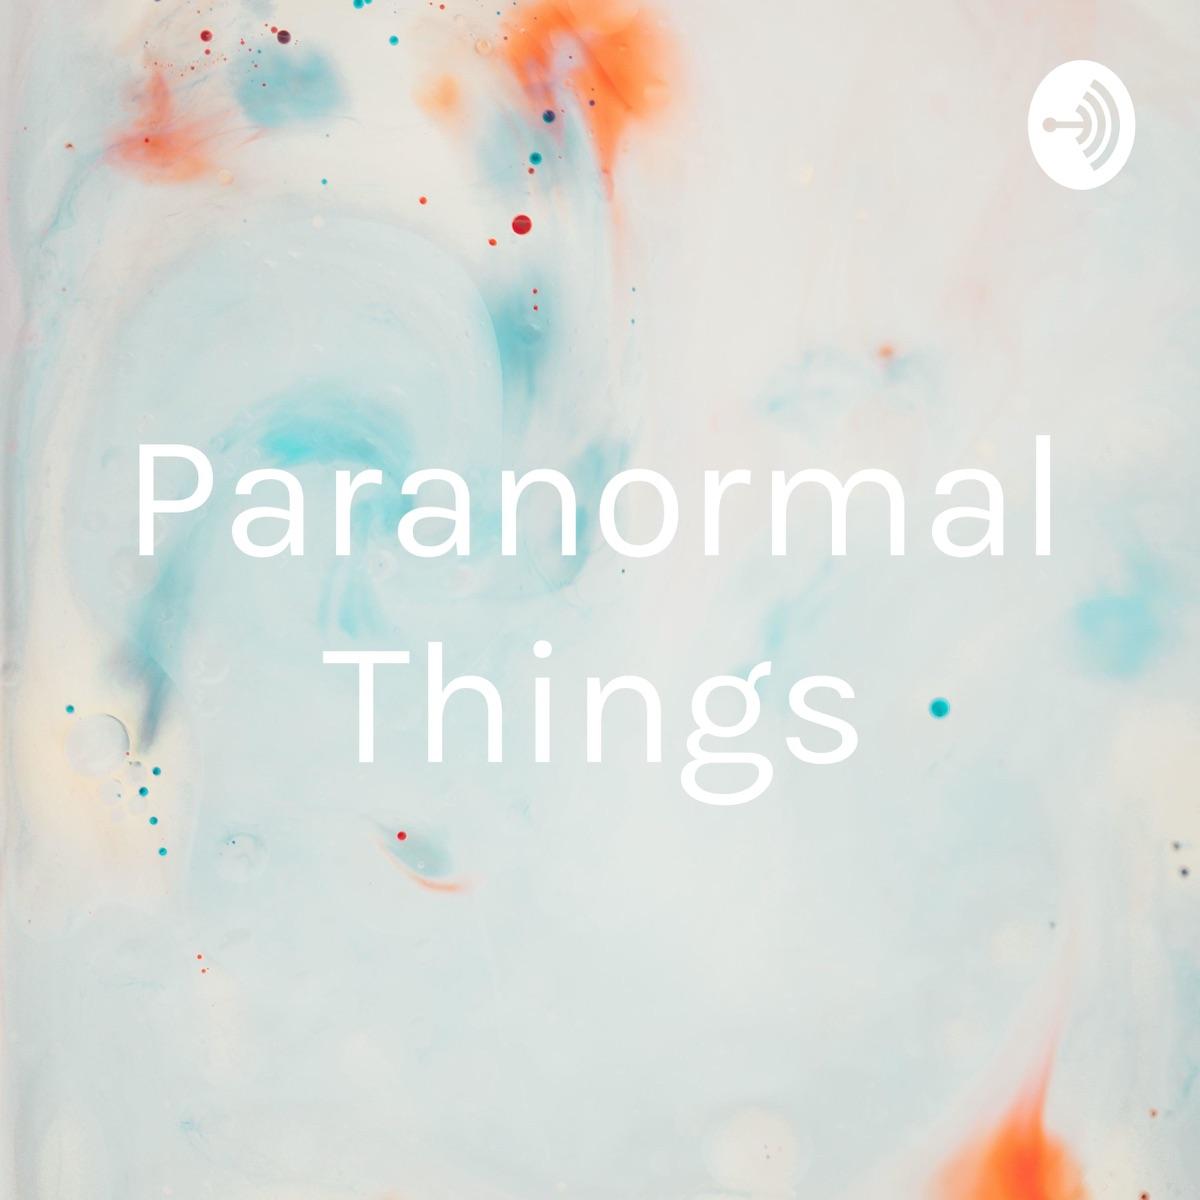 Paranormal Things